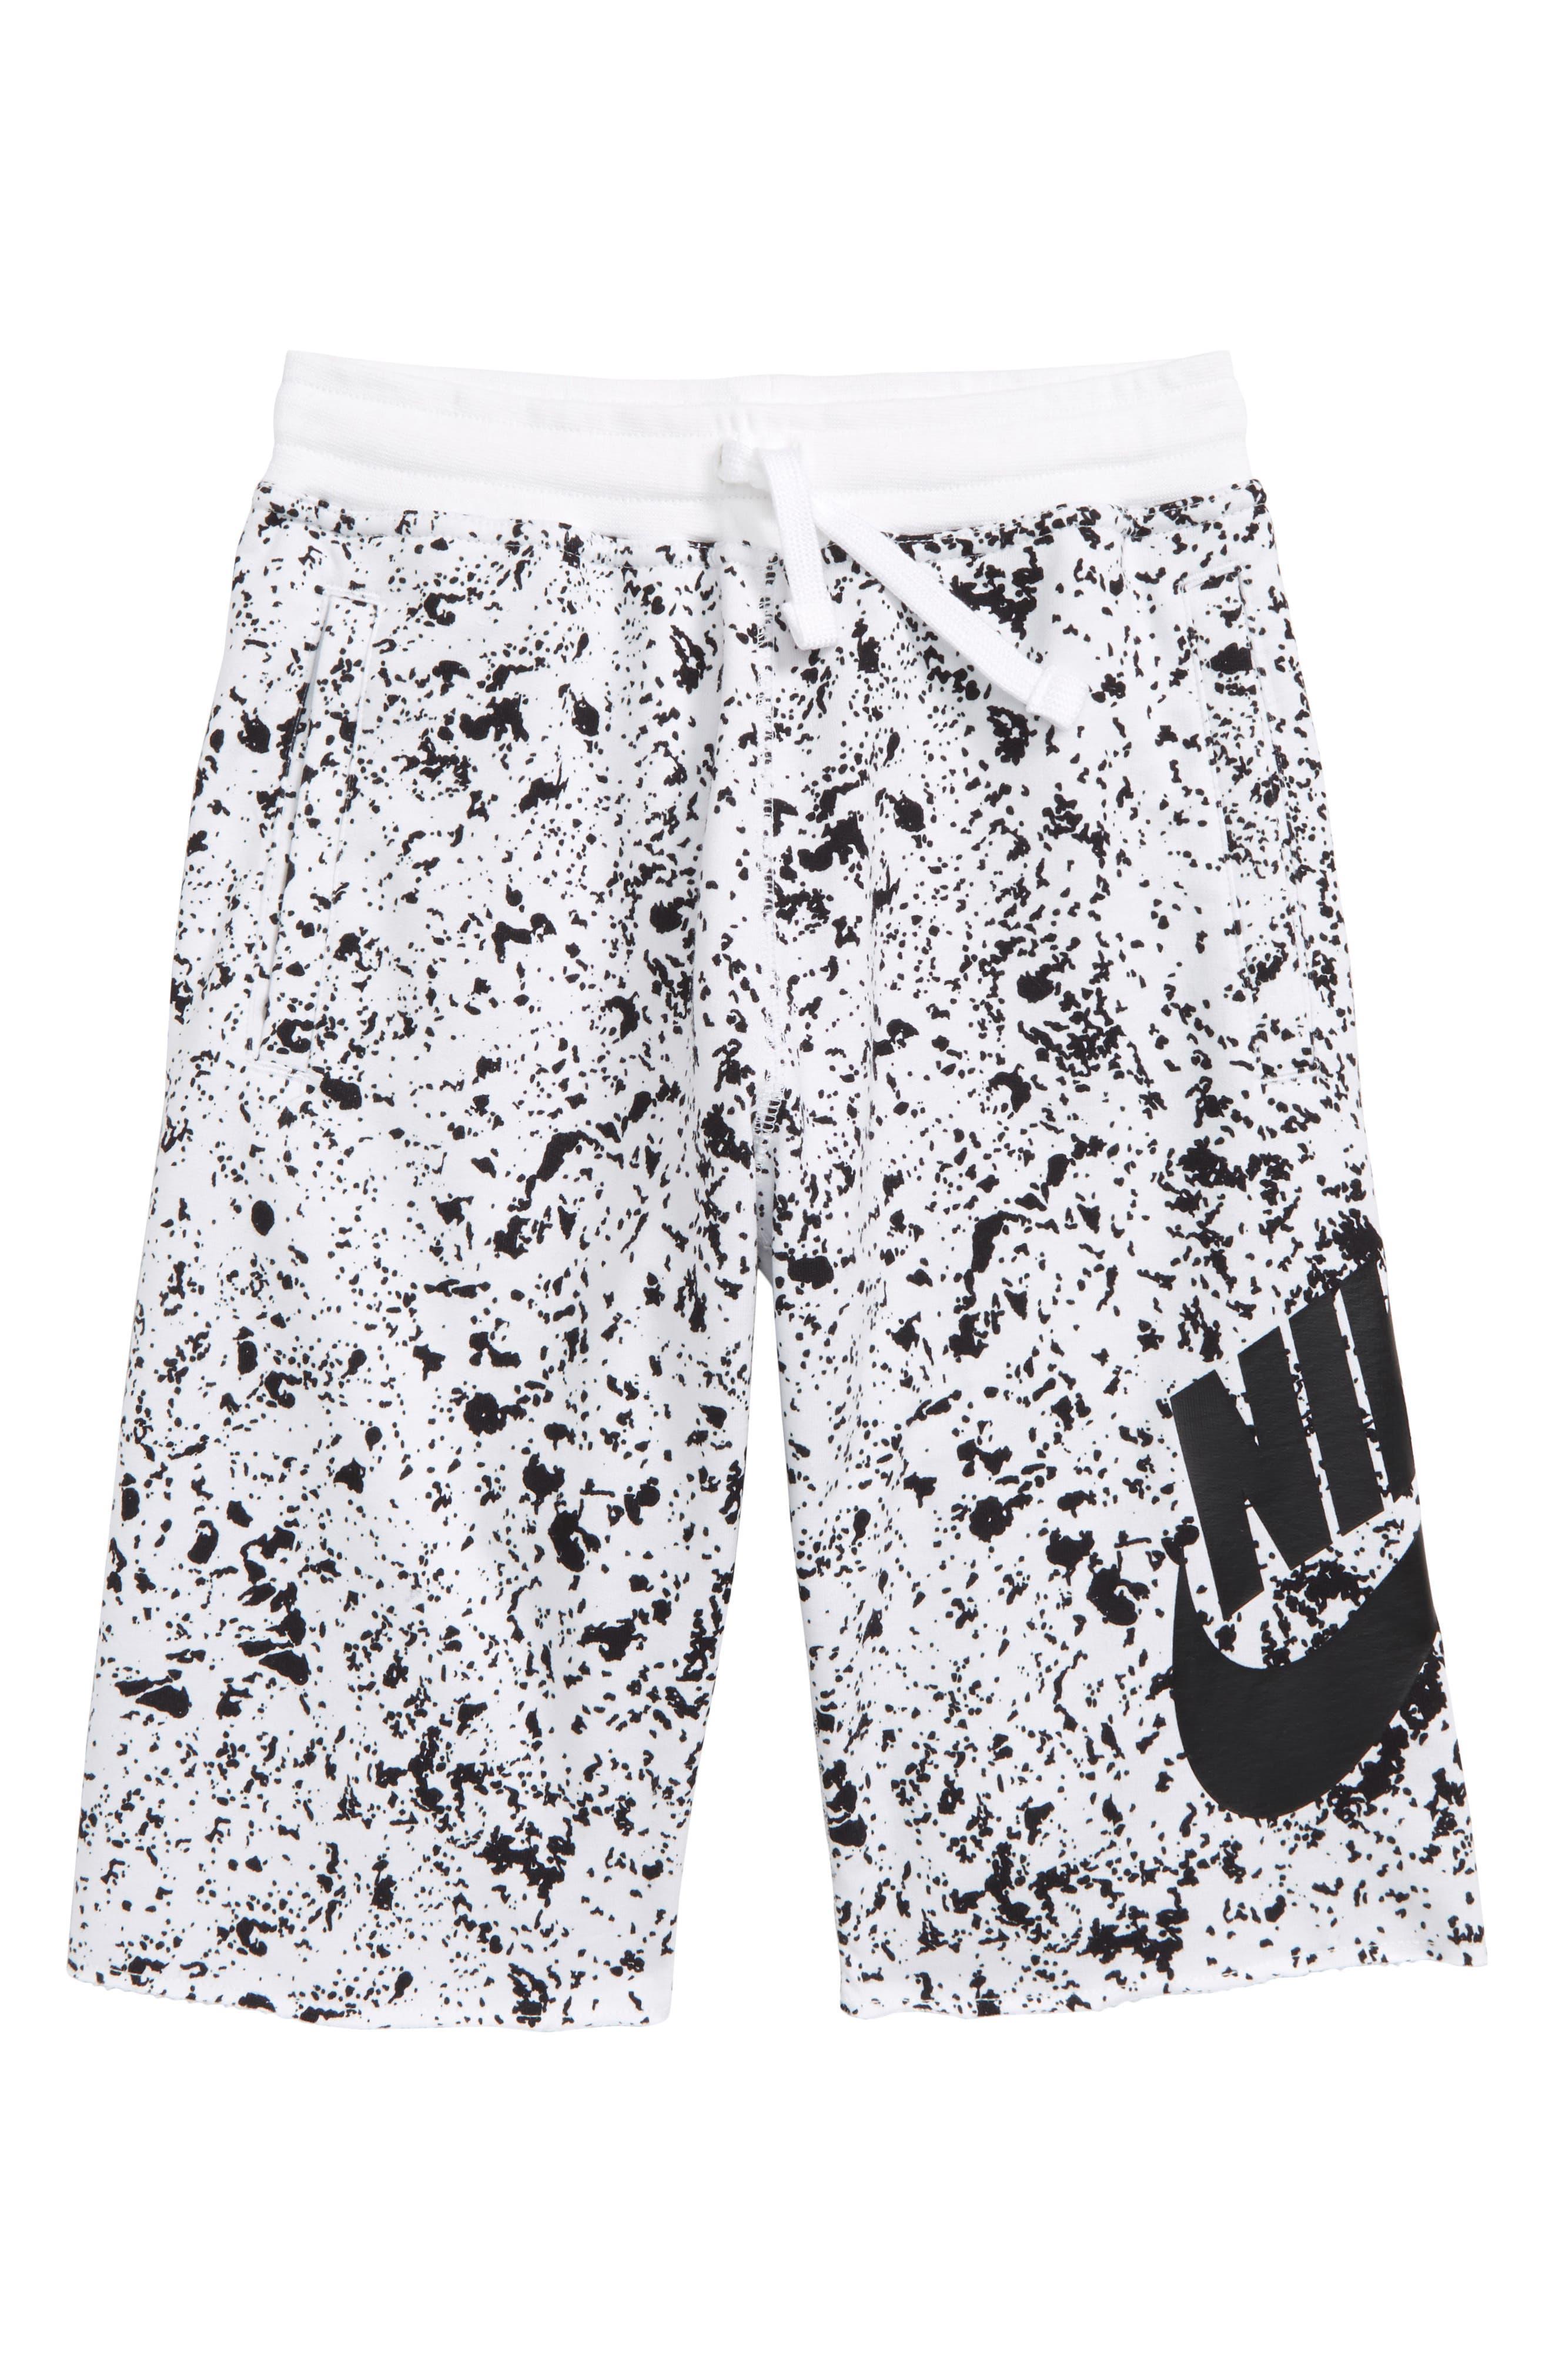 Sportswear Alumni Shorts,                         Main,                         color, WHITE/ BLACK